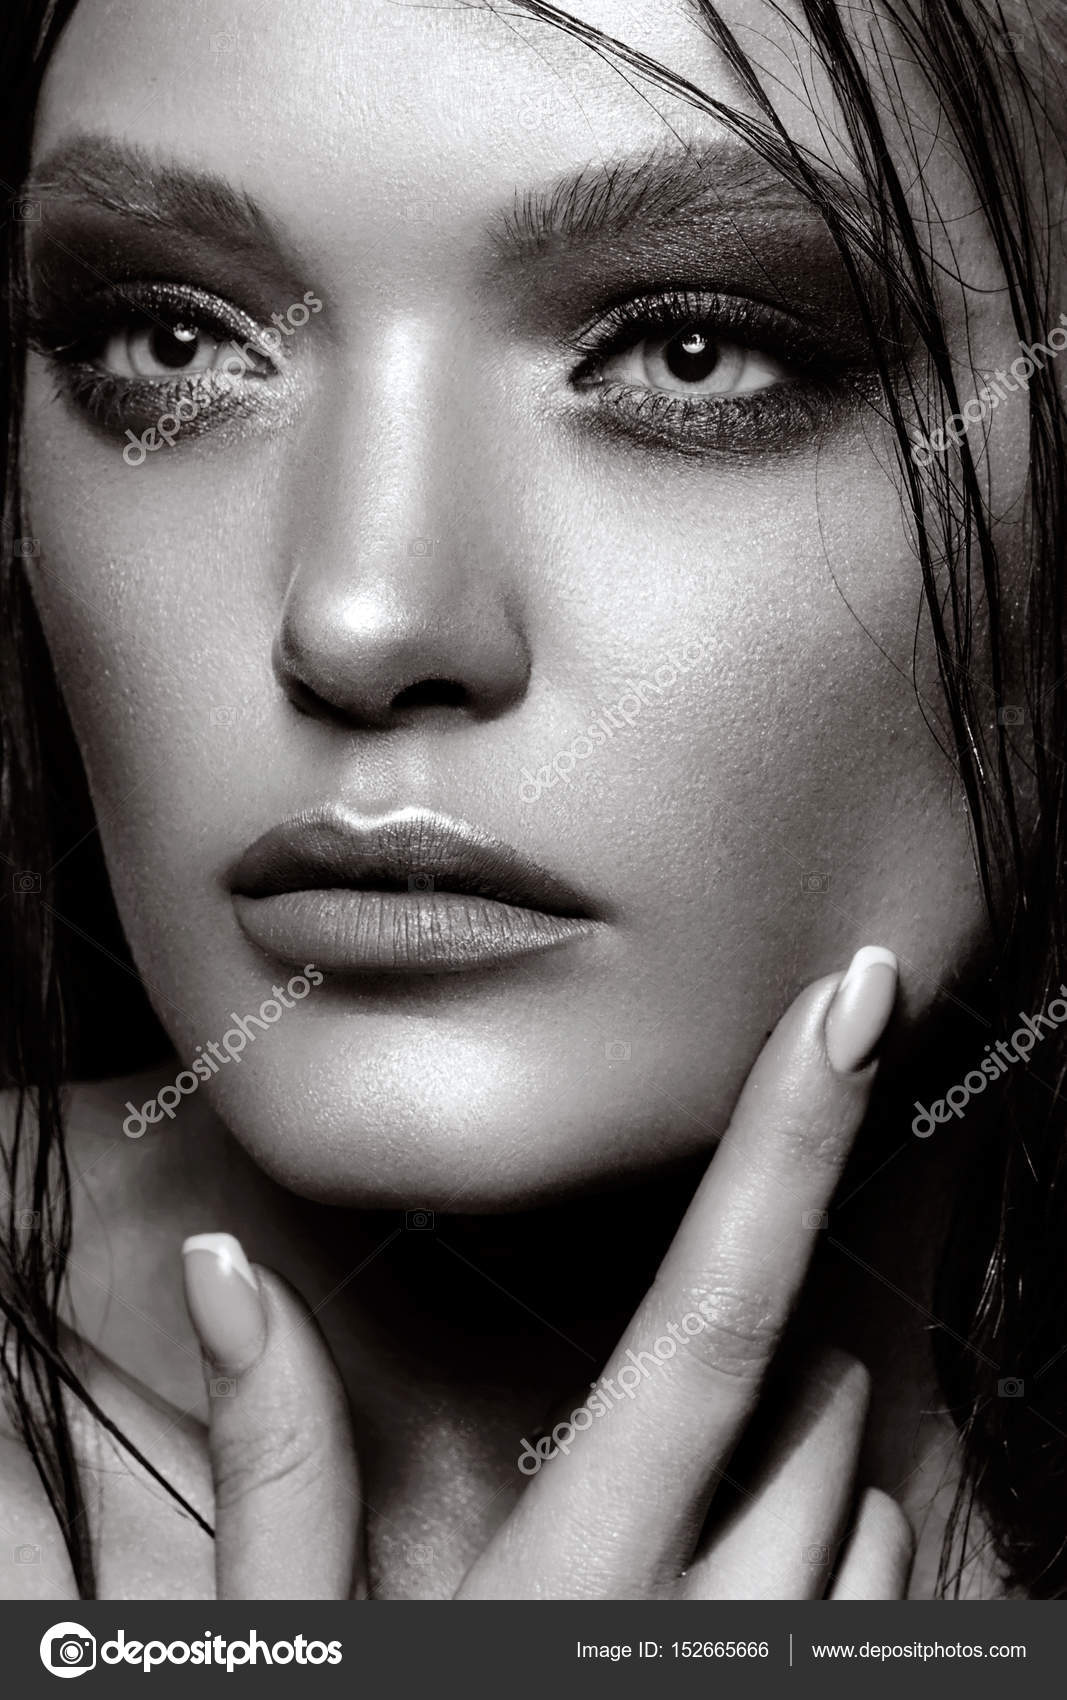 Fashion stylish beauty portrait beautiful girls face close up hairstyle professional makeup make up vogue style woman black and white portrait